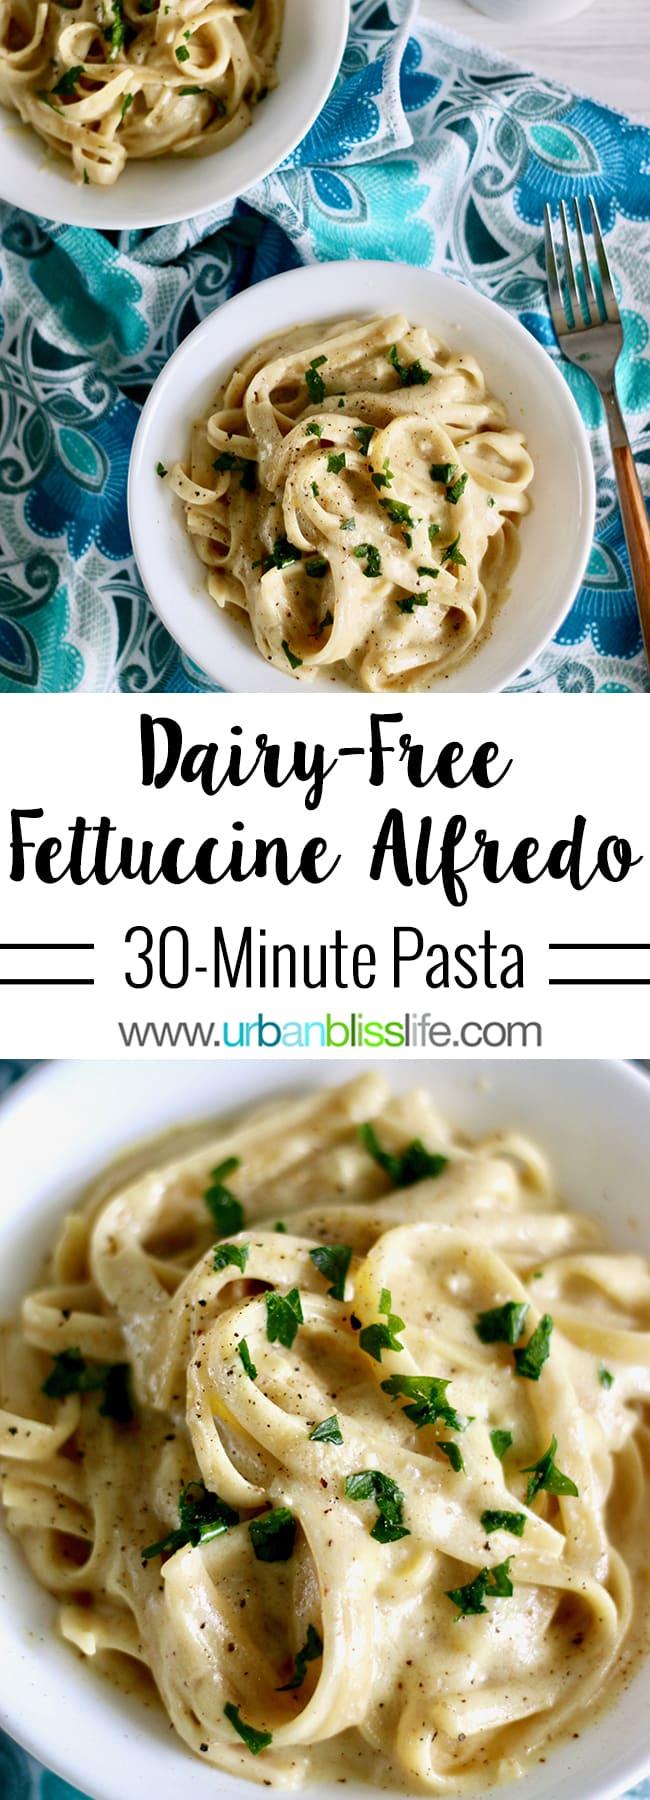 Dairy-Free Fettuccine Alfredo